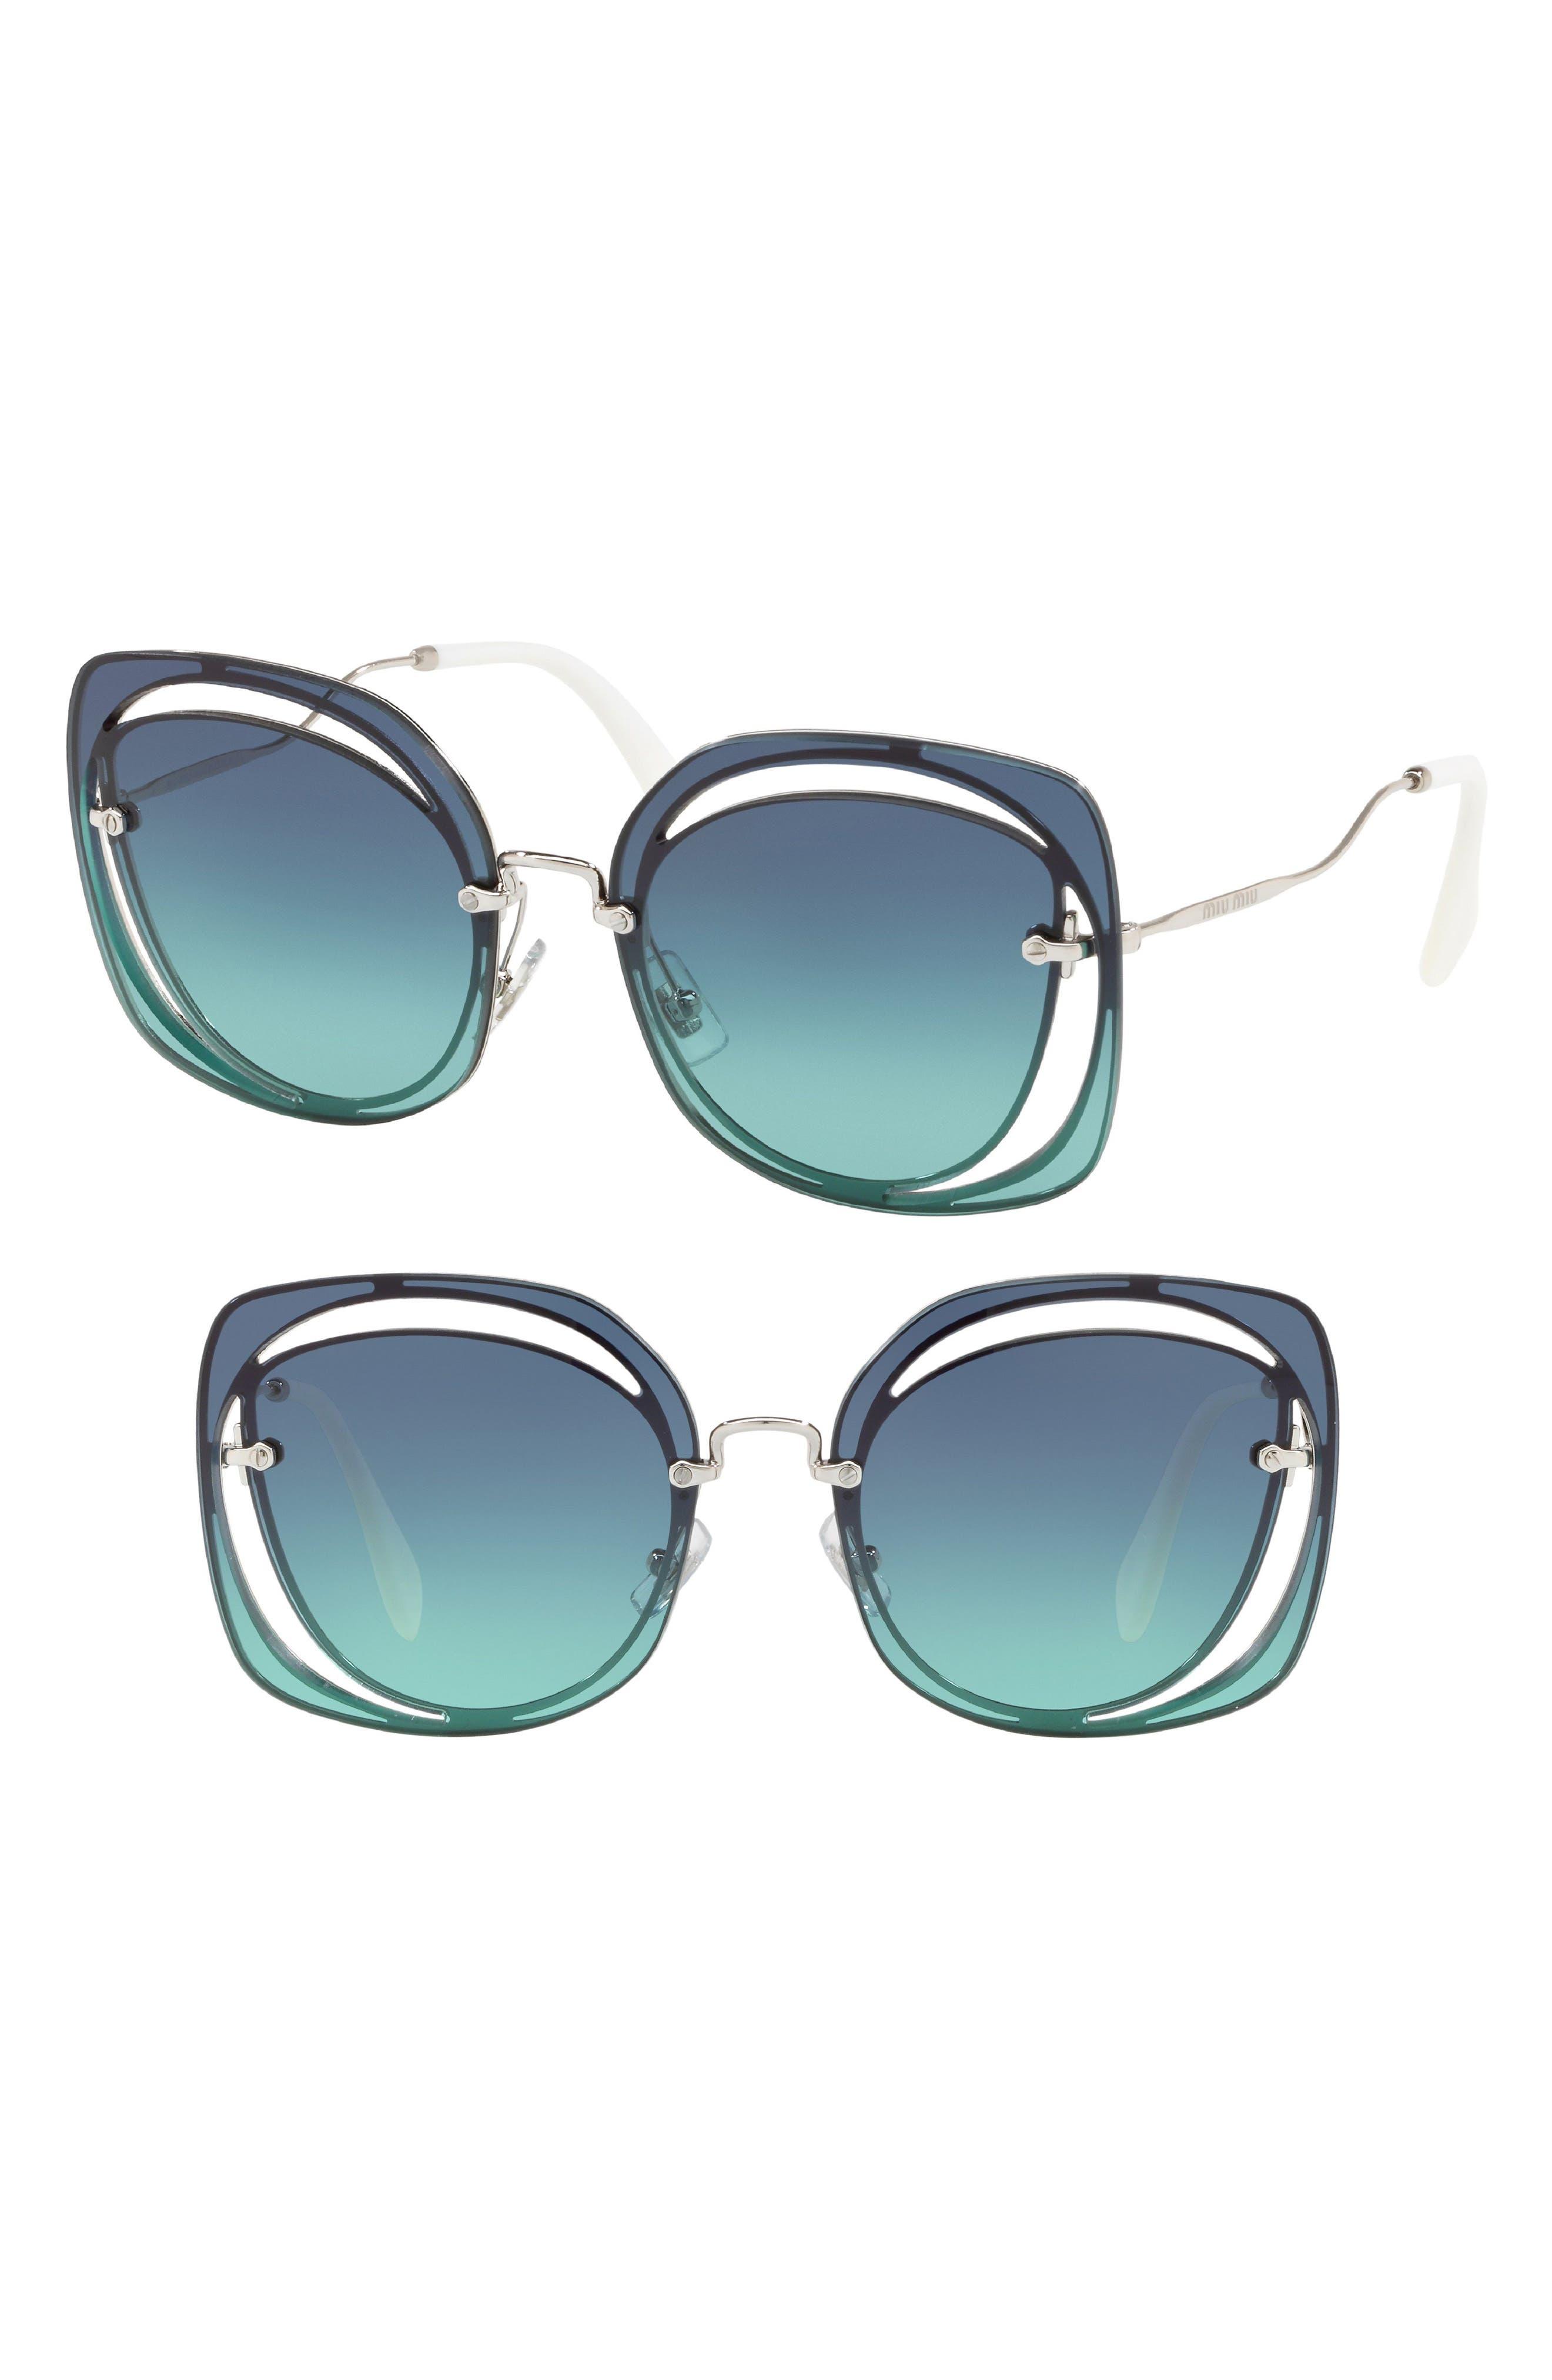 64mm Oversize Sunglasses,                             Main thumbnail 1, color,                             400